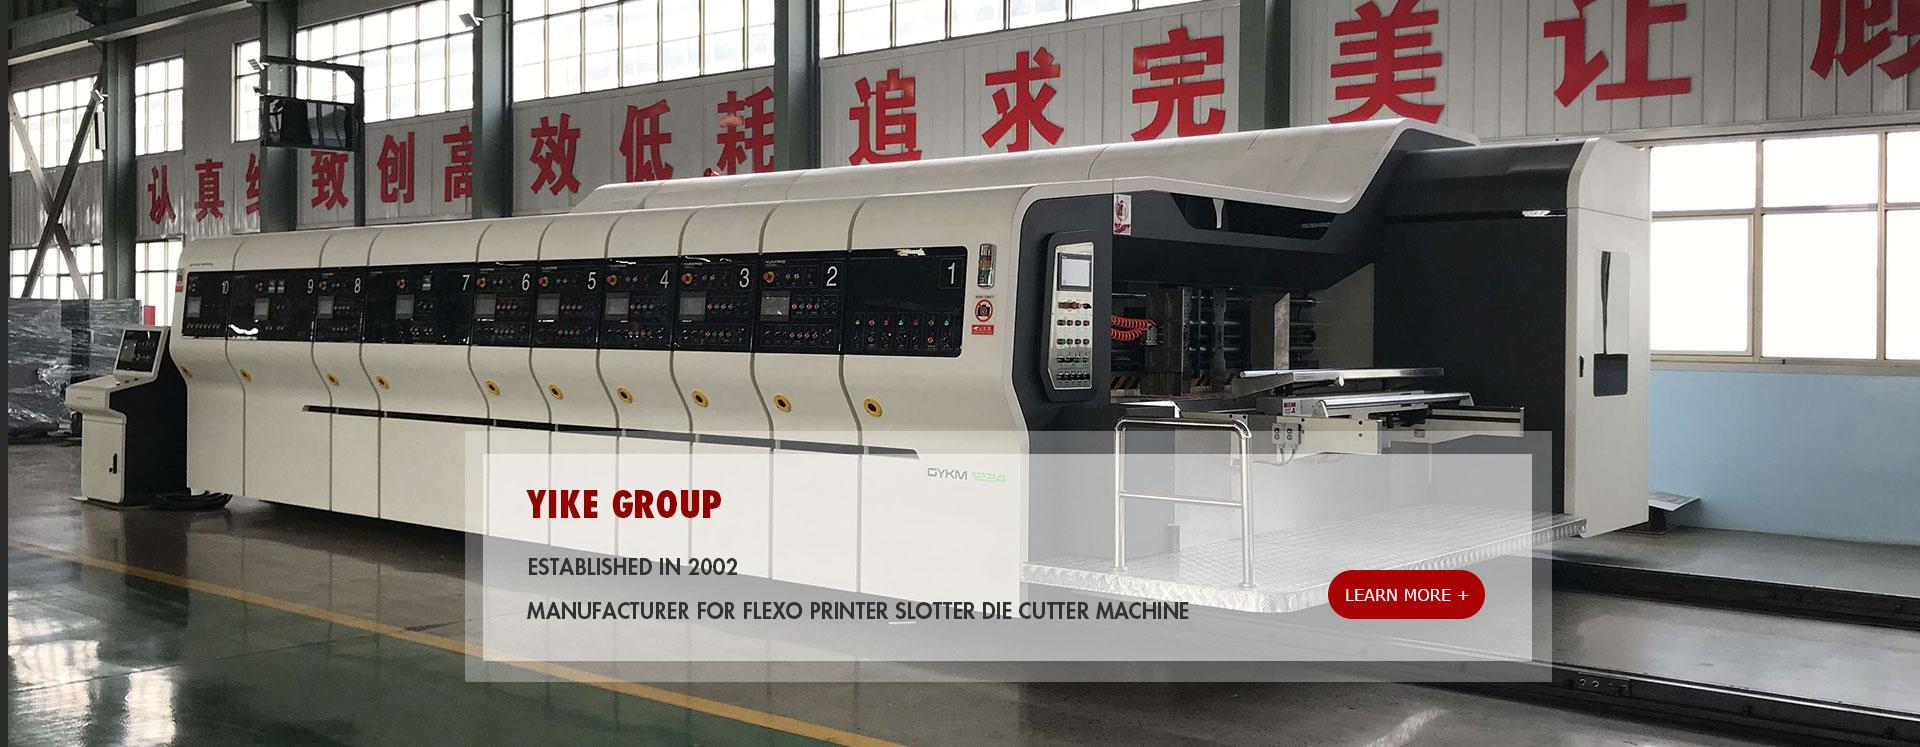 2019 New Model High Defination Flexo Printer Slotter Machine YIKE GROUP